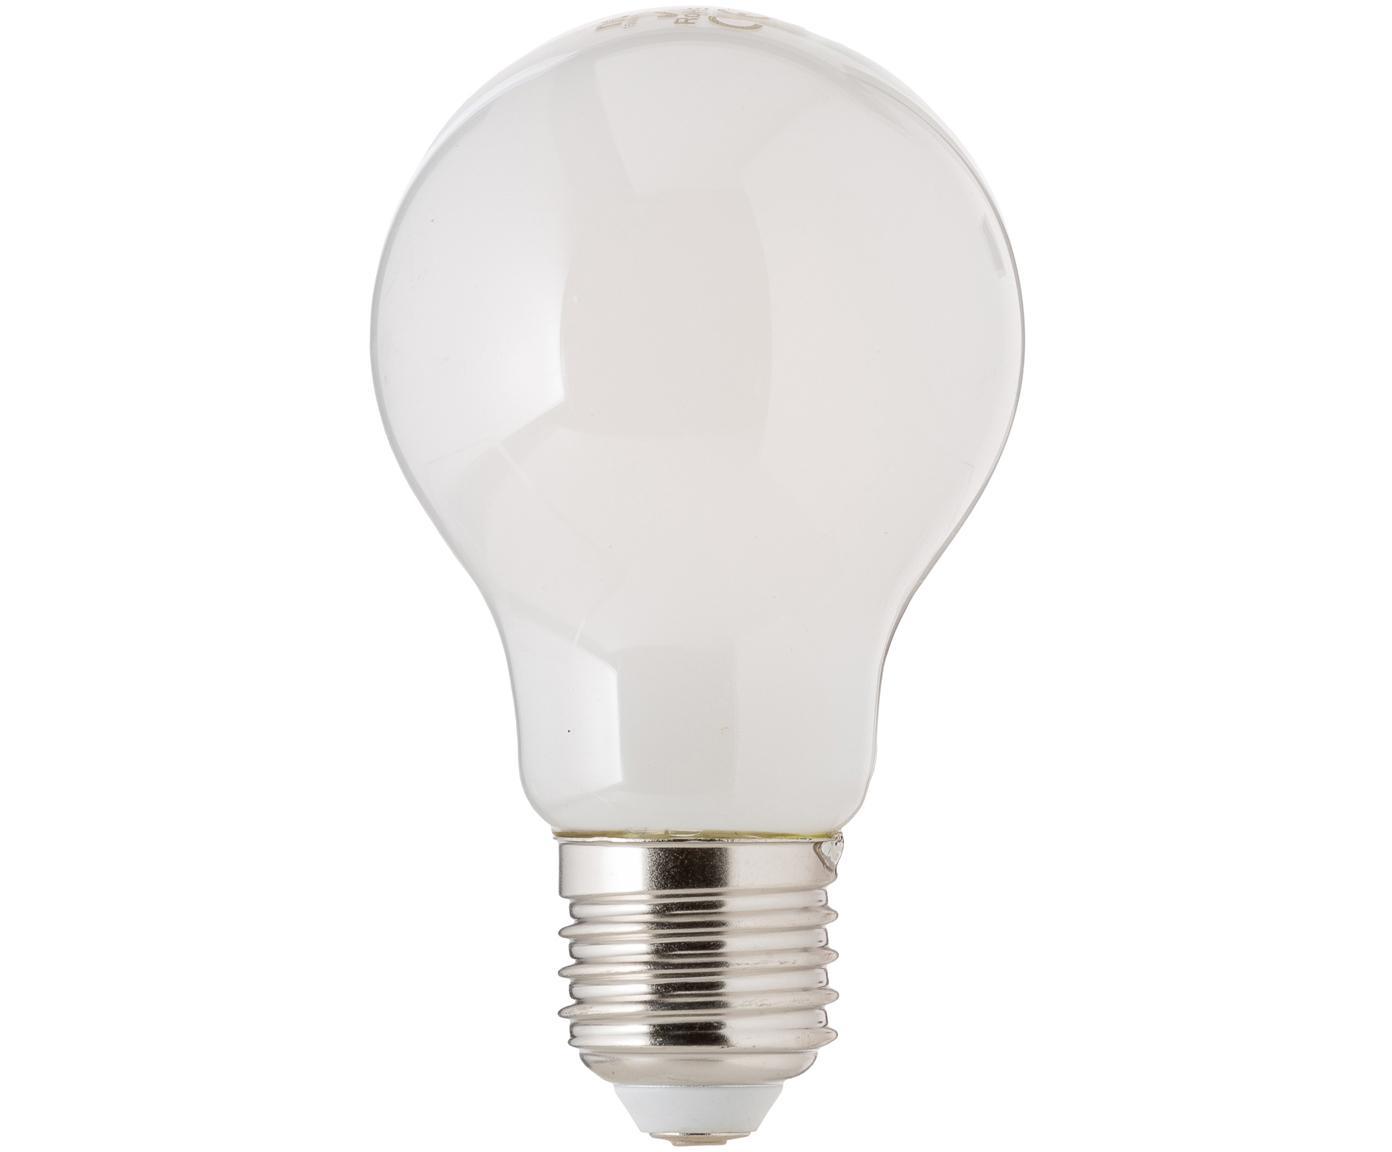 Lamp Hael (E27 / 4W) 5 stuks, Peertje: opaalglas, Fitting: aluminium, Wit, Ø 8 x H 10 cm